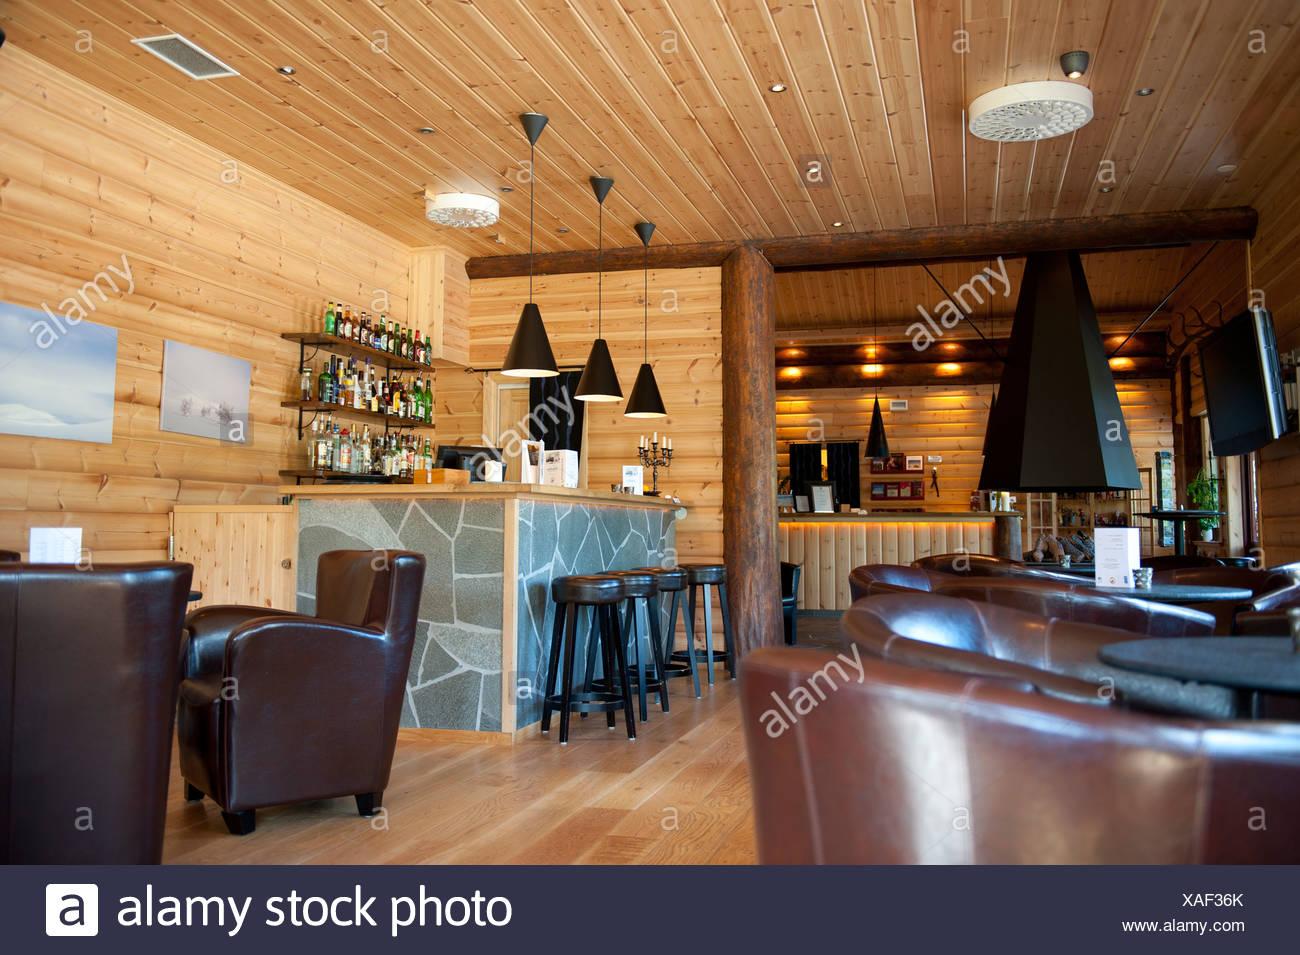 Reception and piano bar with leather armchairs, Storsaetra Fjaellhotell Hotel, near Groevelsjoen, Dalarna province, Sweden - Stock Image